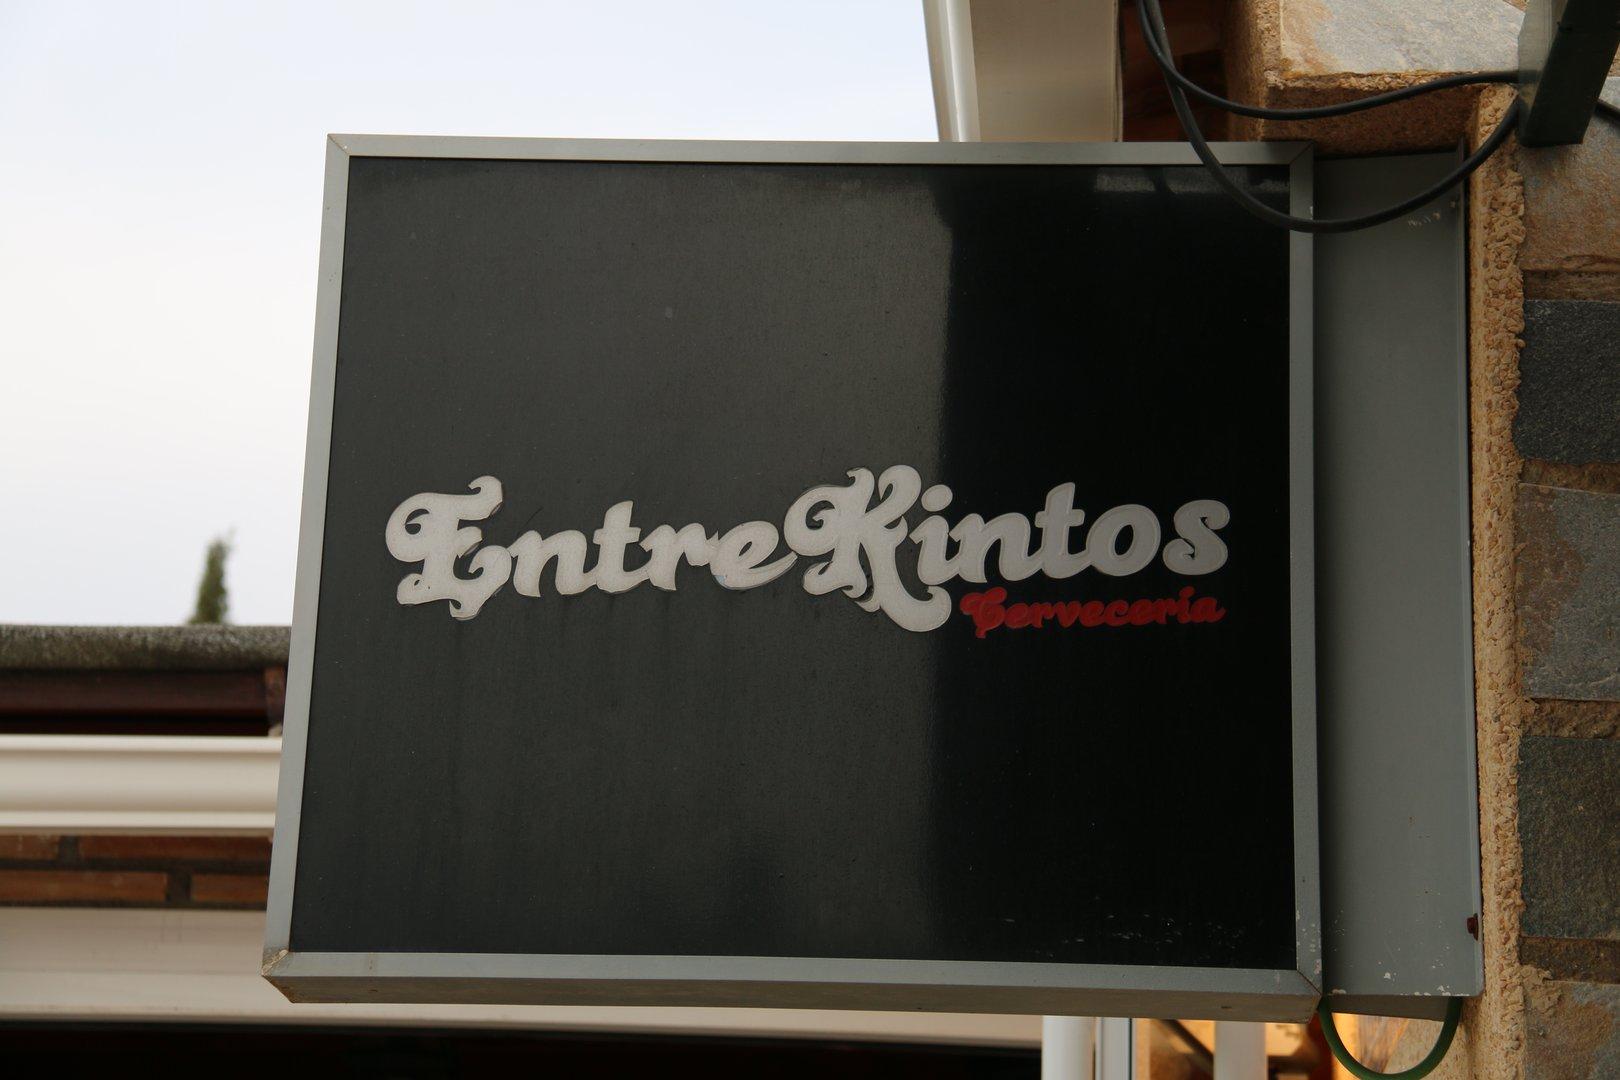 Club social Entrequintos